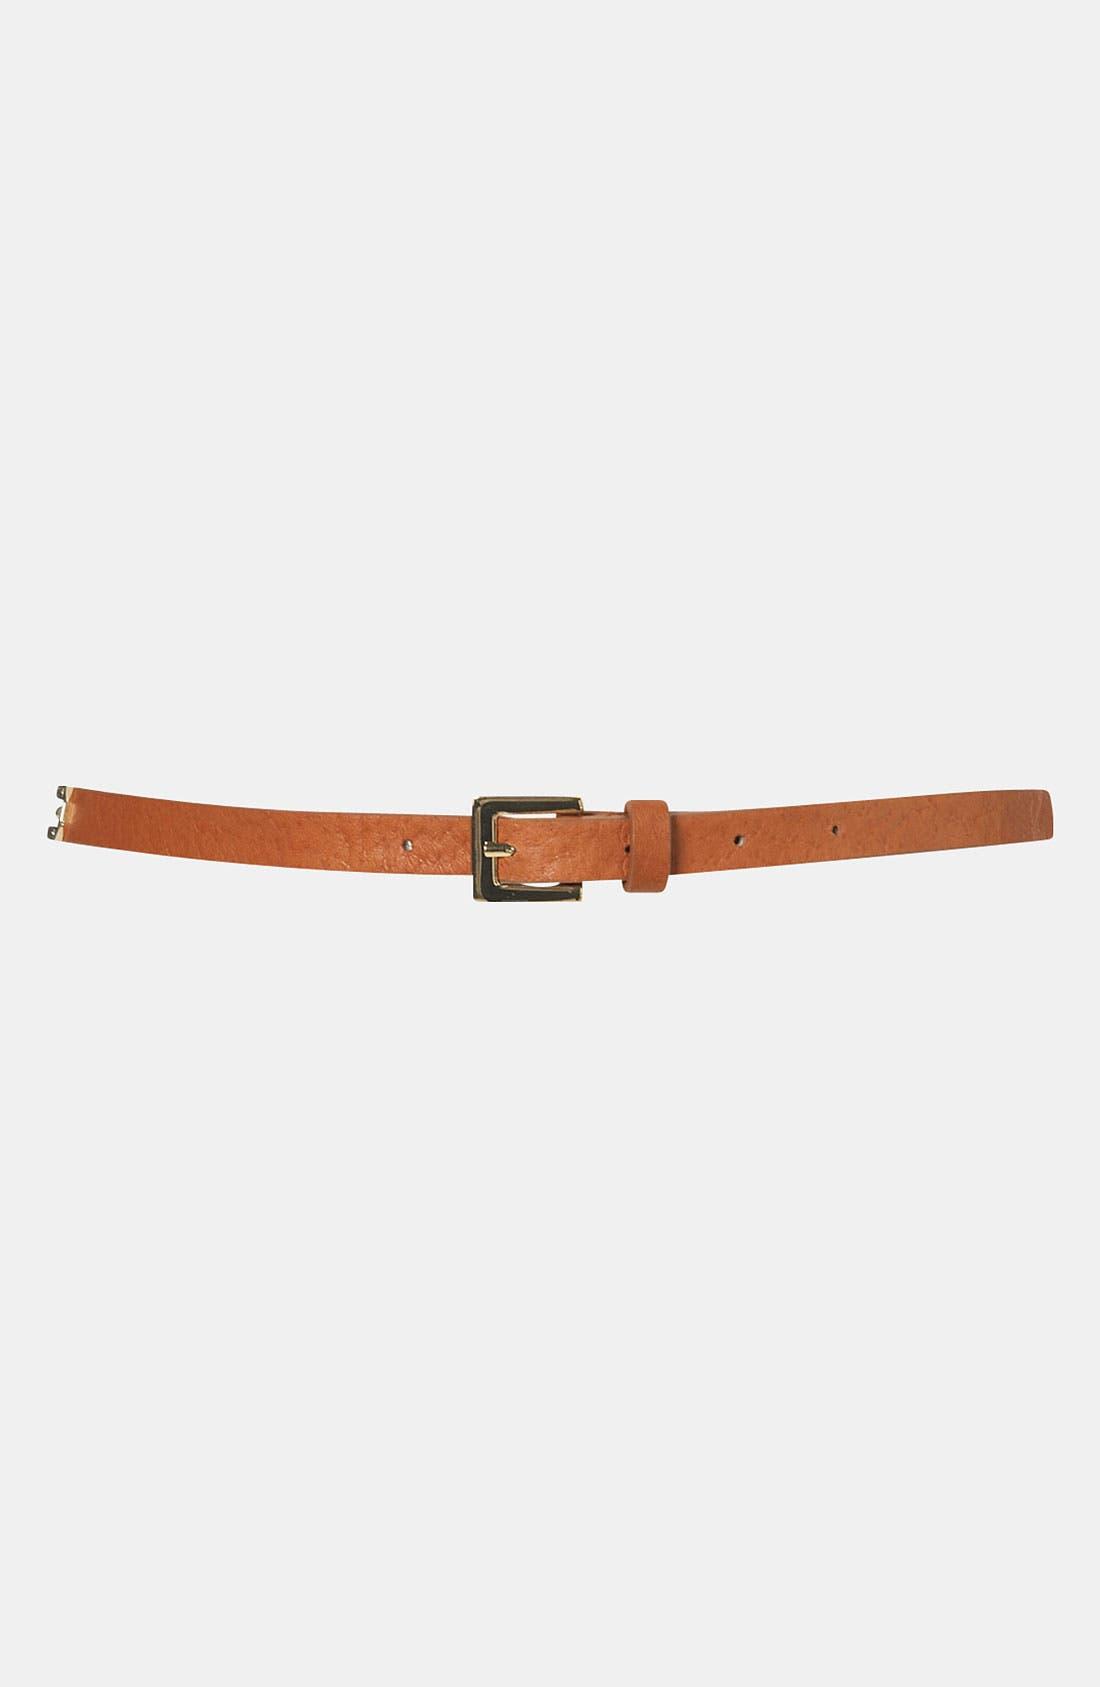 Main Image - Topshop 'Snaffle' Skinny Belt